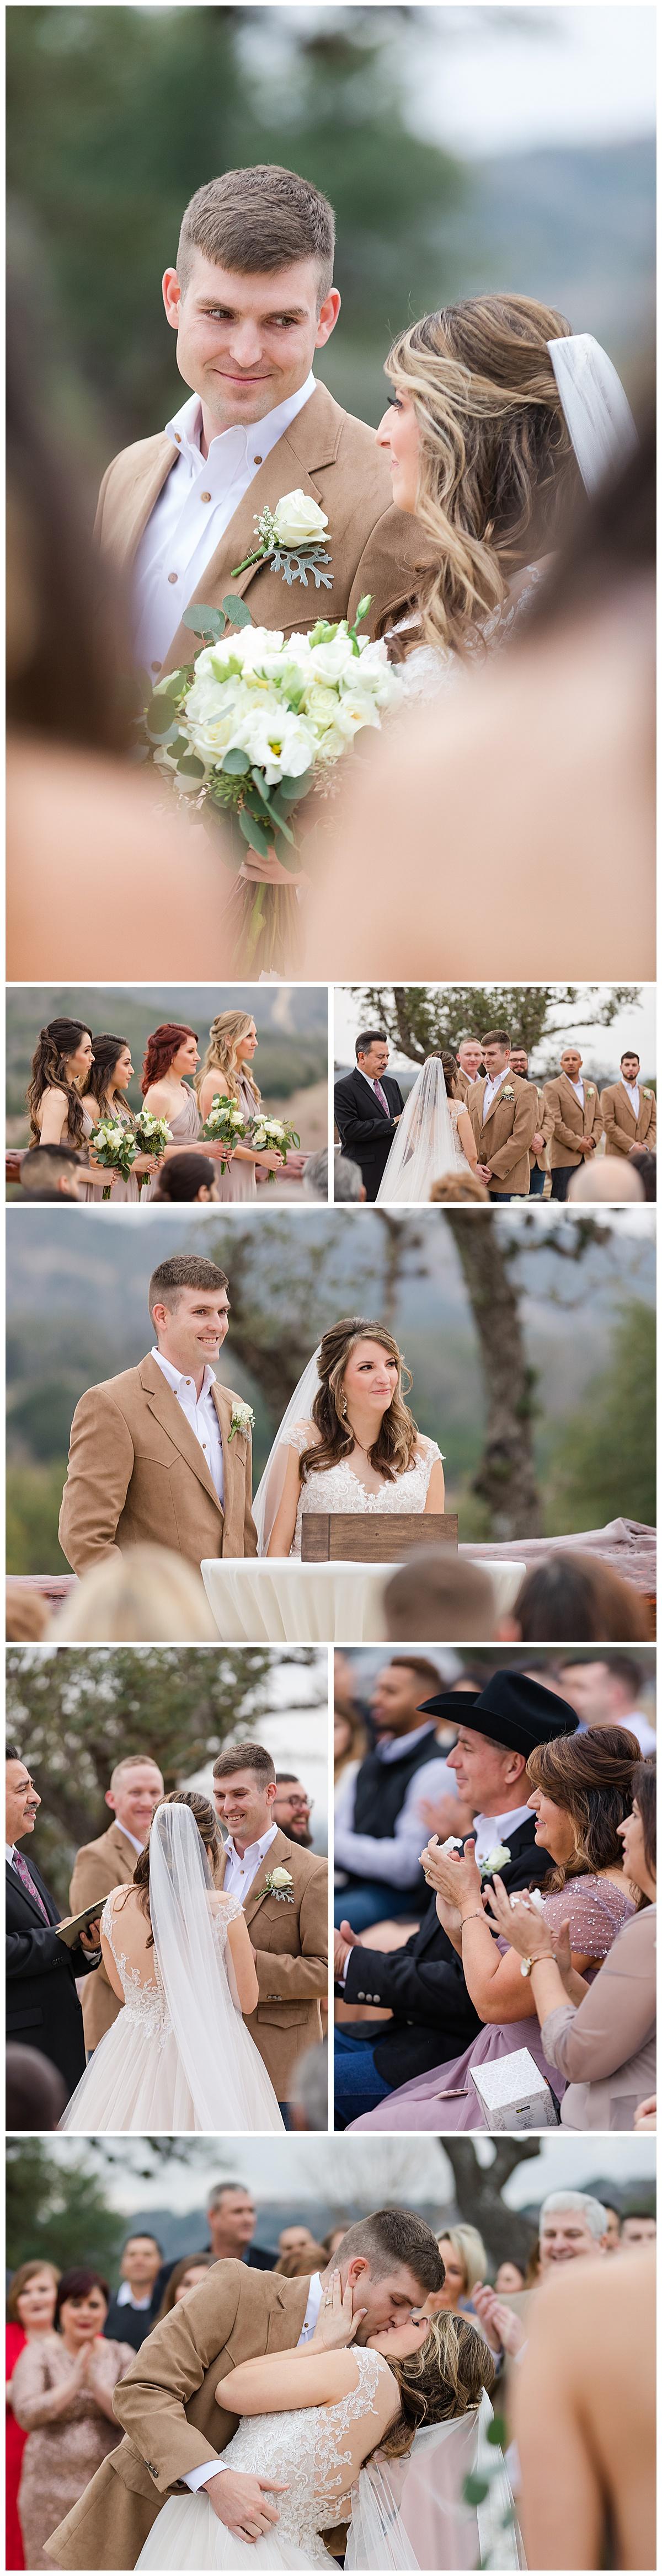 Wedding-Photographer-Texas-Hill-Country-Happy-H-Ranch-Comfor-Texas-Carly-Barton-Photography_0032.jpg